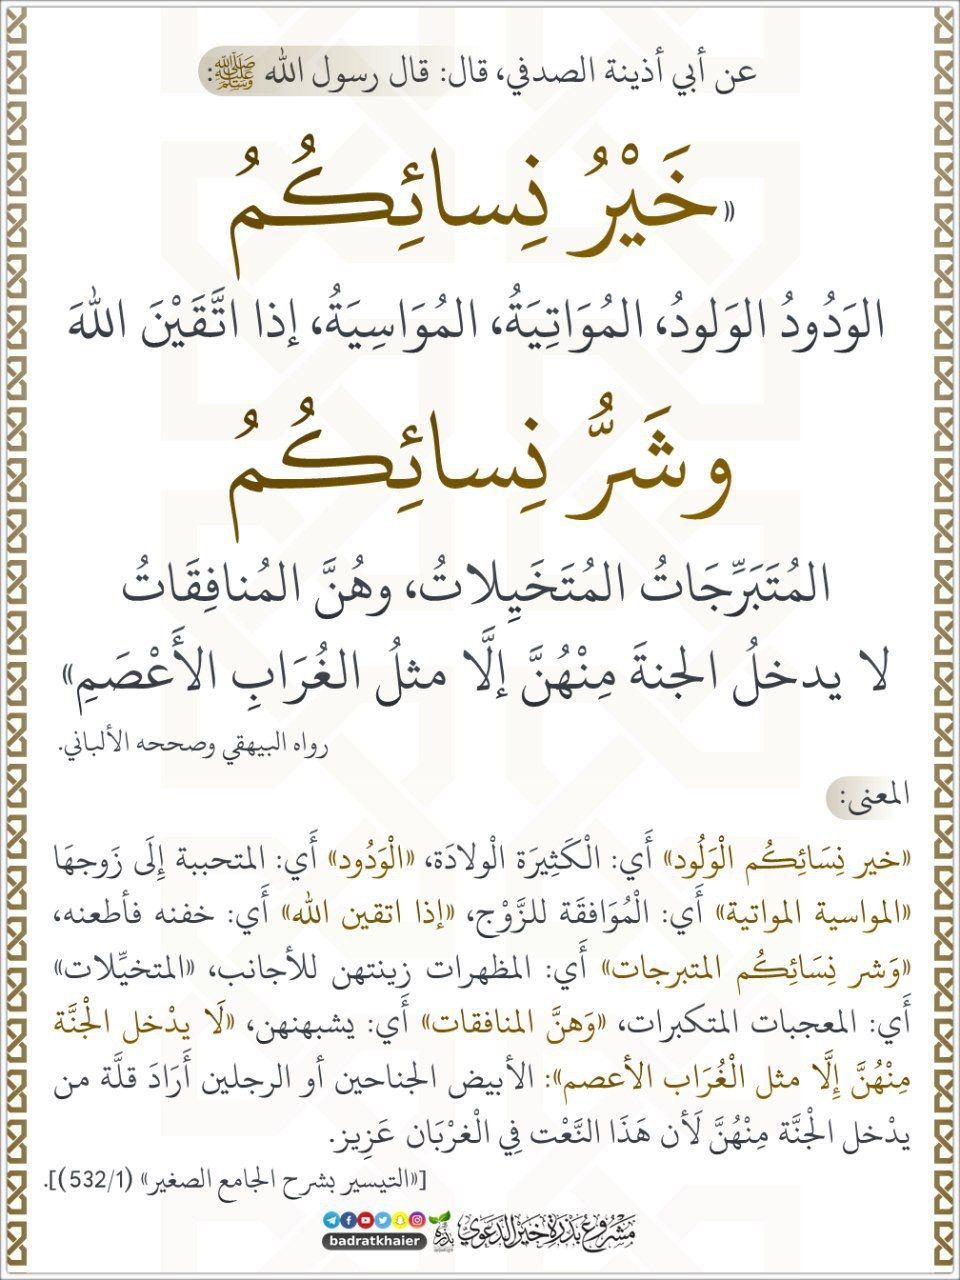 Pin By Abdeljalil El Khamsi On من هدي النبي صلى الله عليه وسلم Islam Facts Ahadith Islamic Information